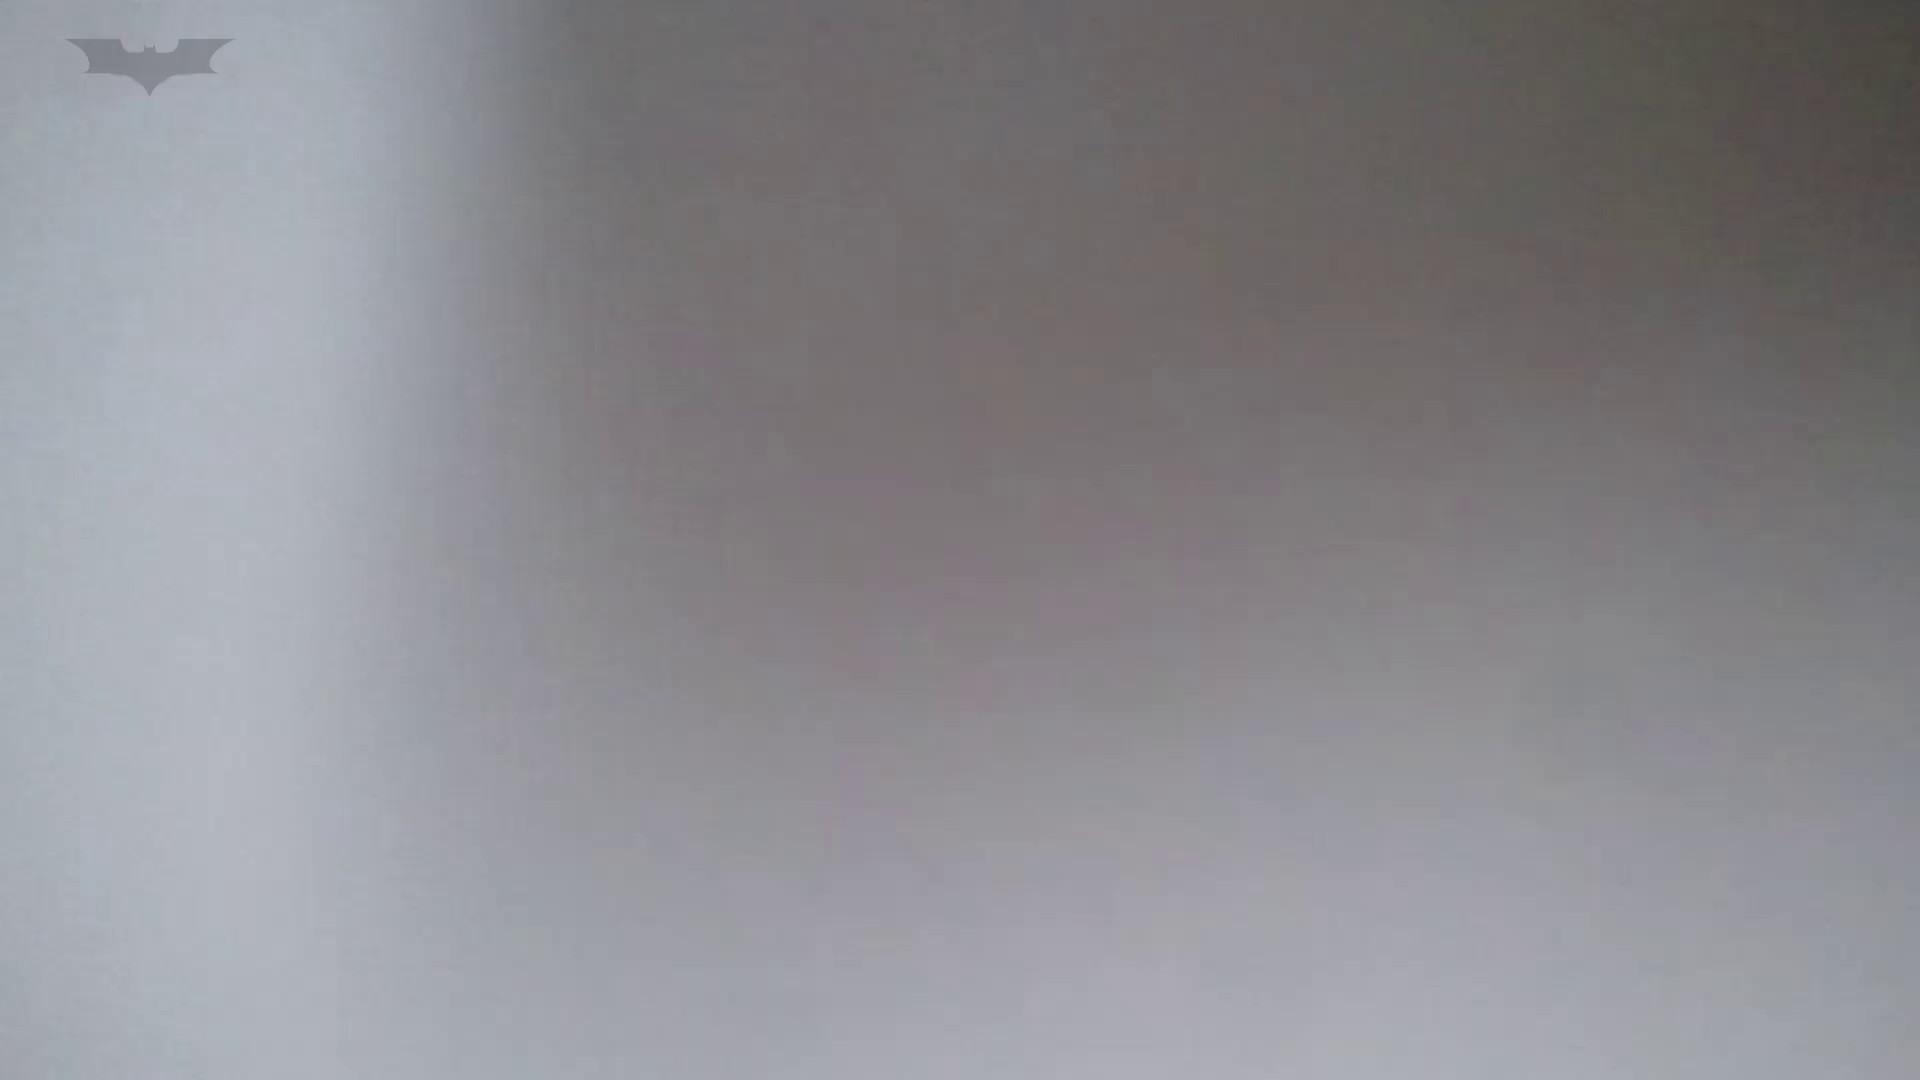 化粧室絵巻 番外編 VOL.22 OLハメ撮り  27Pix 19